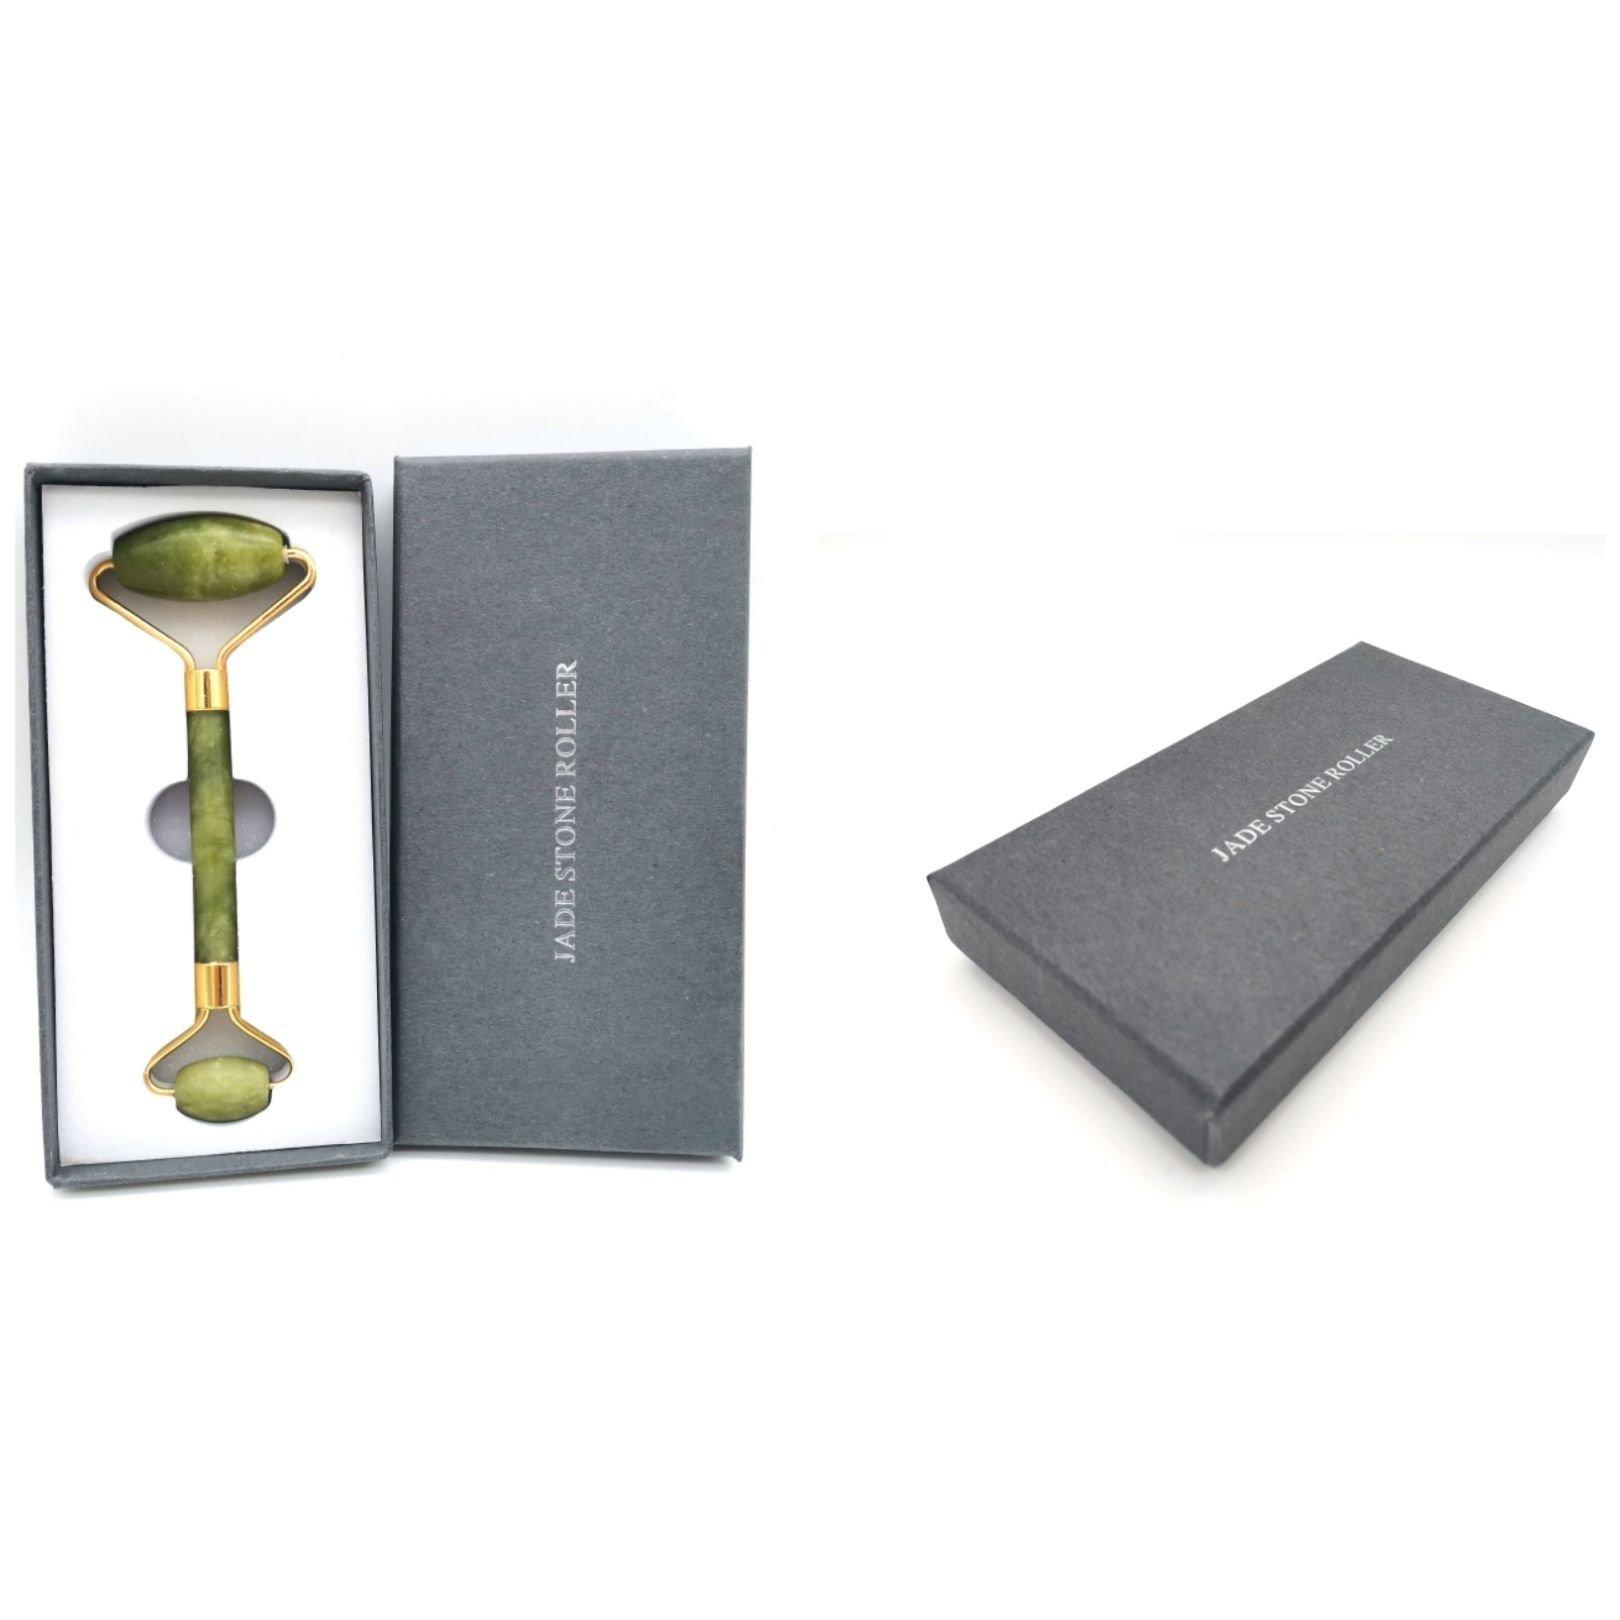 Jade Roller Grön i present ask